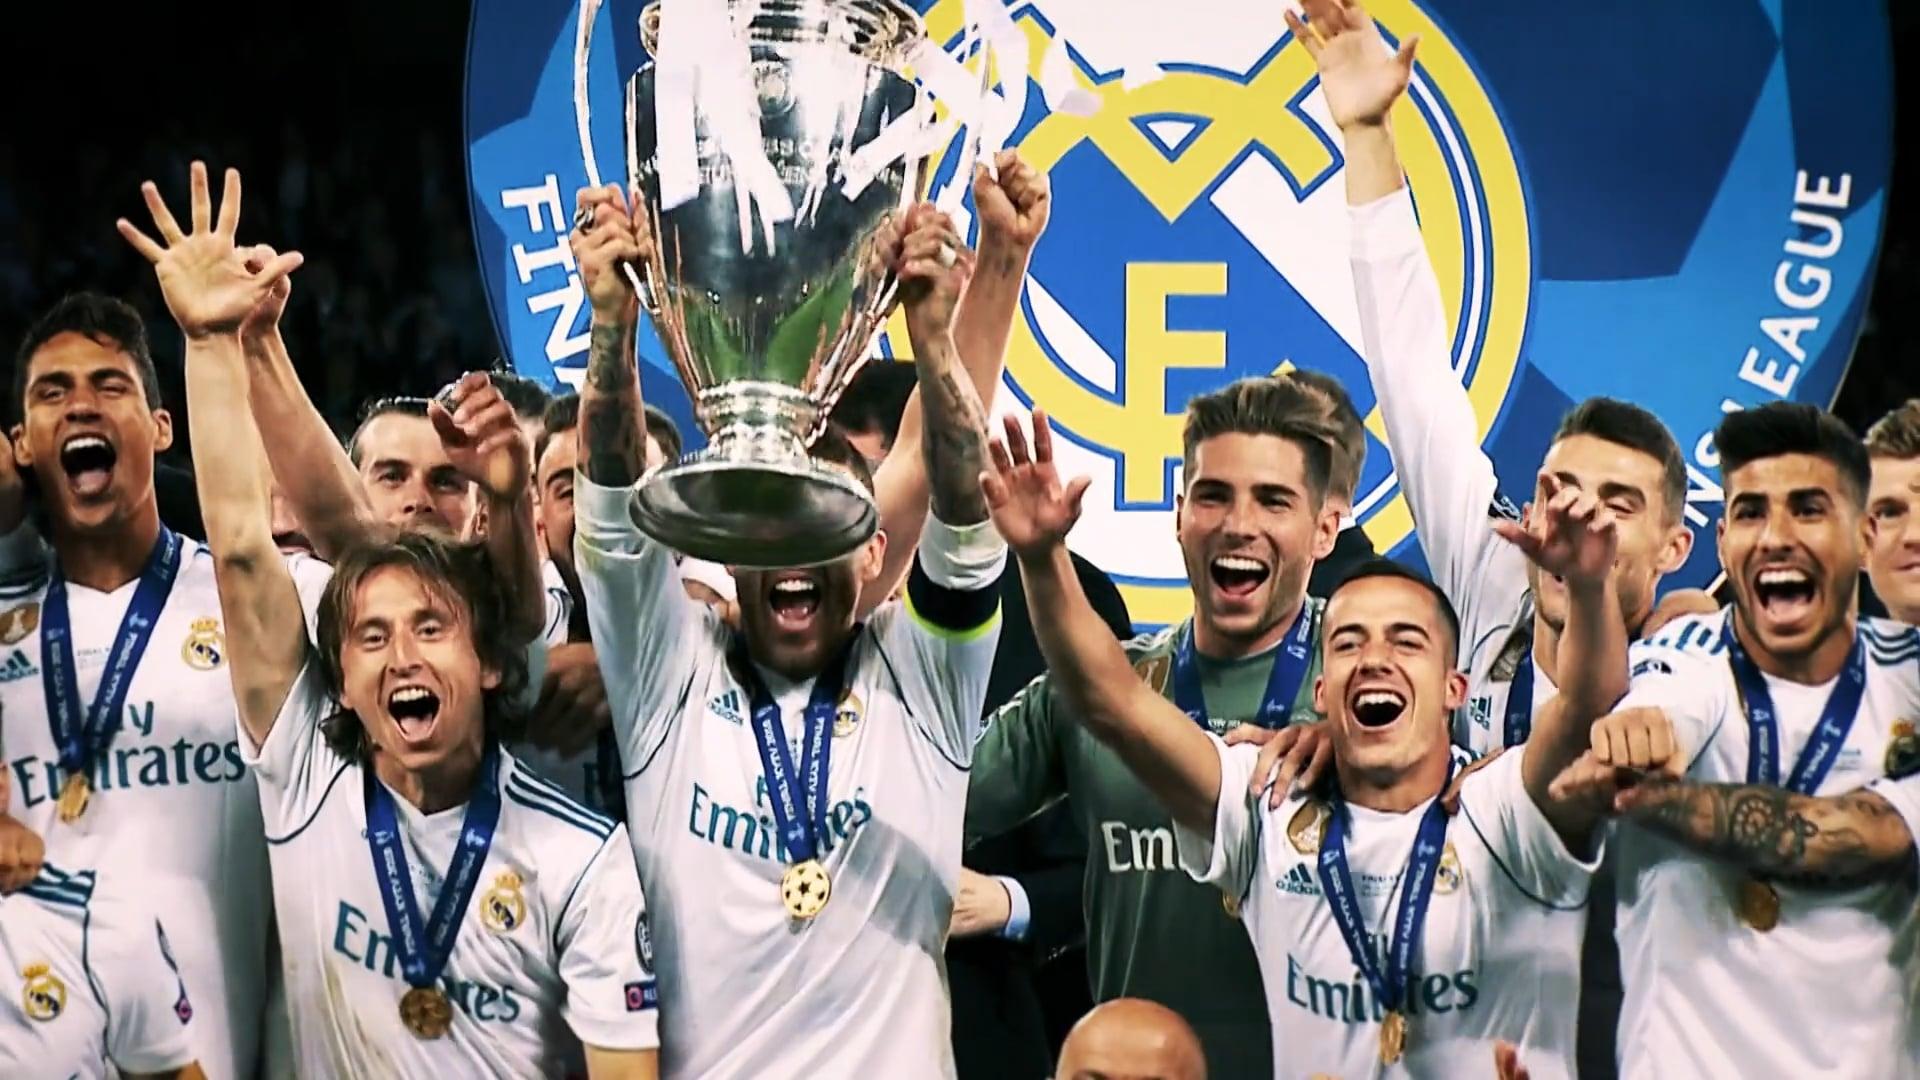 Champions League - Inter Milan vs. Real Madrid